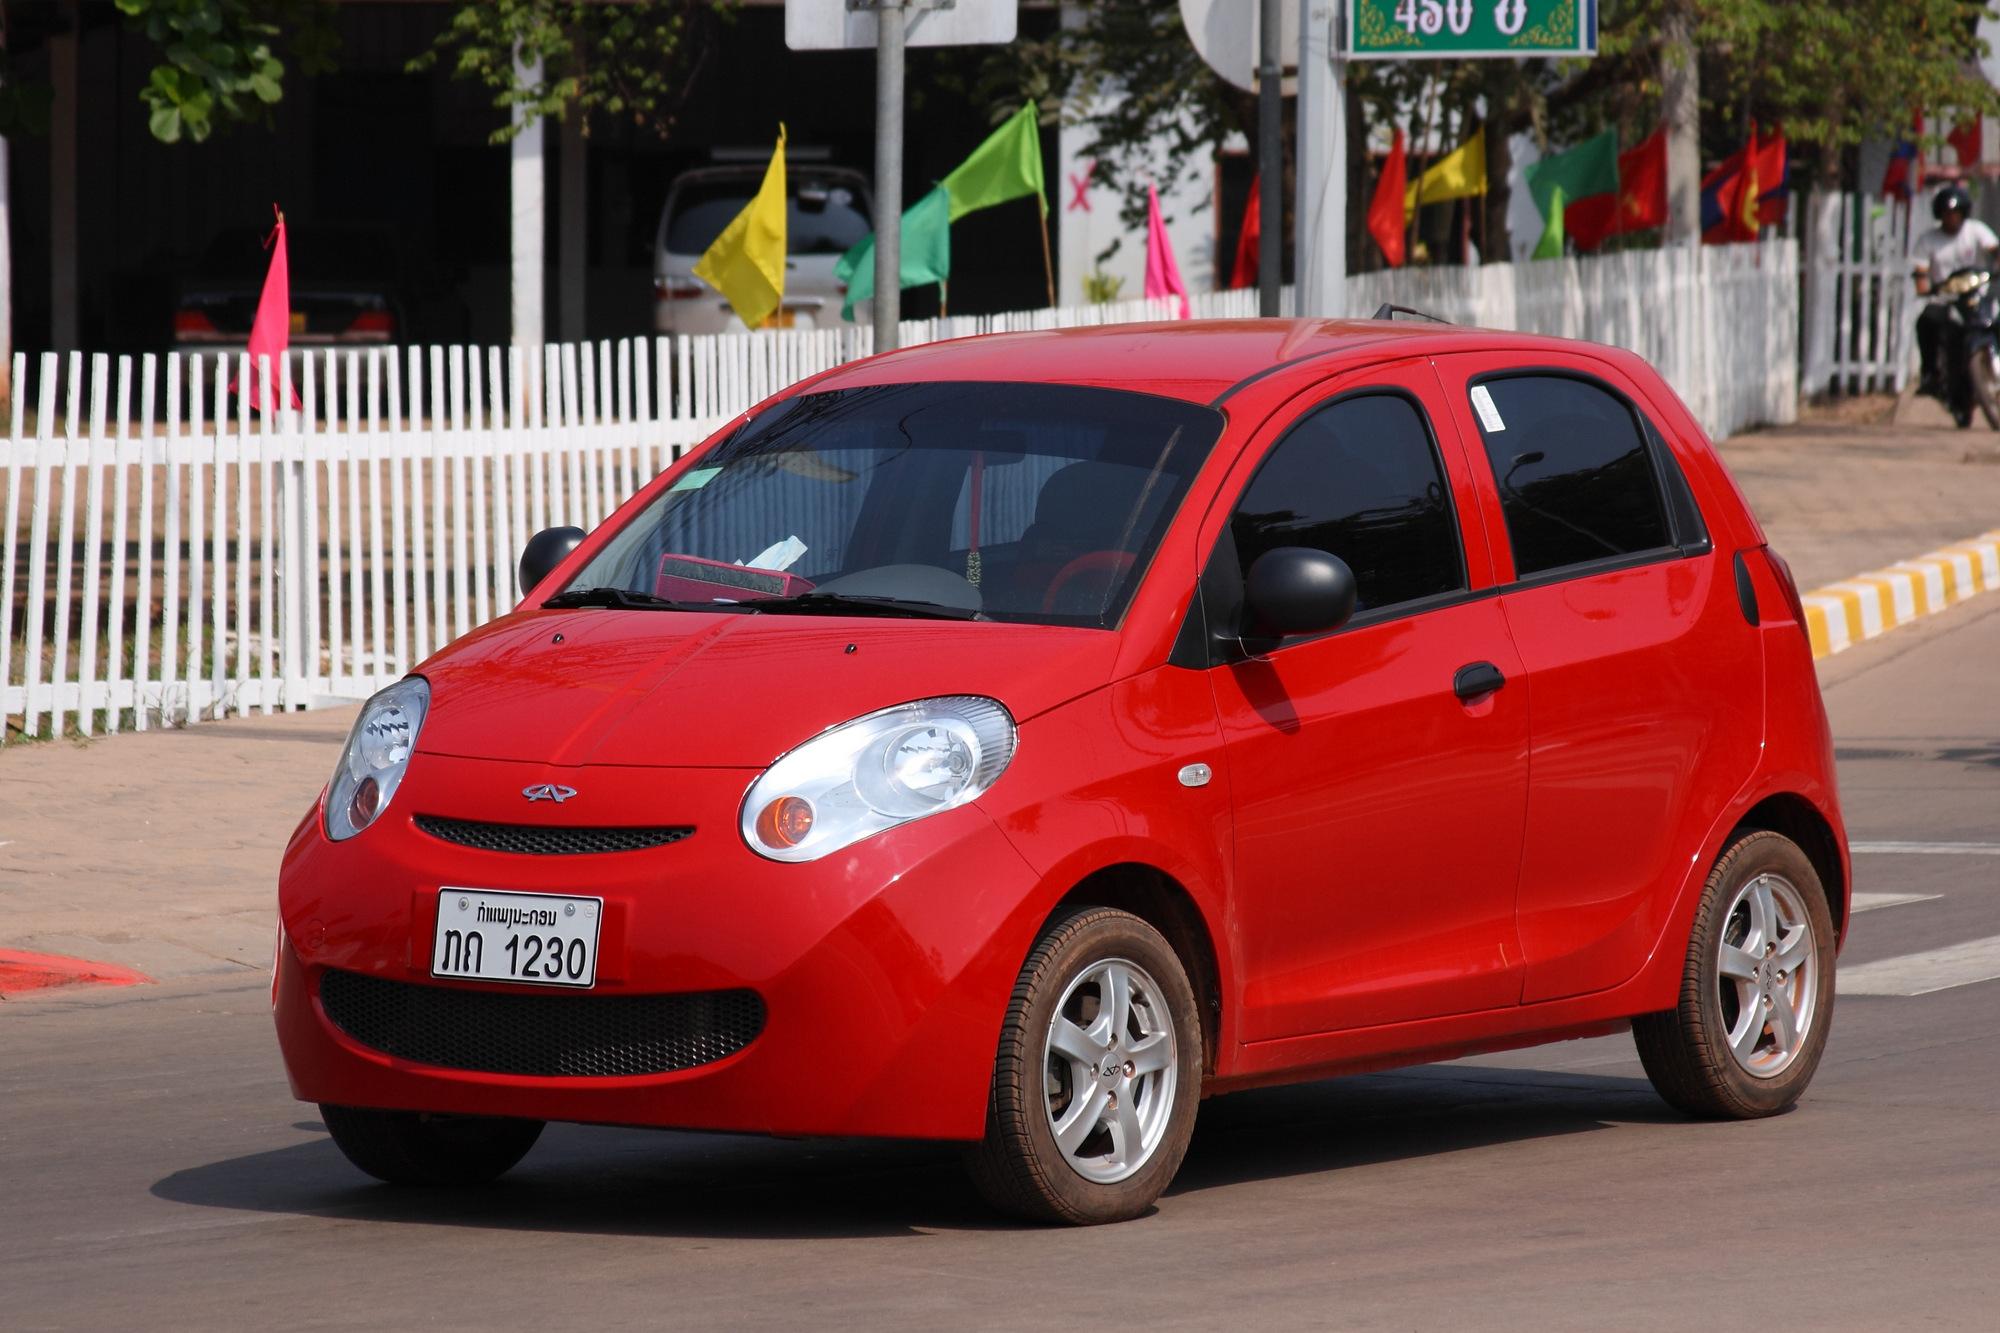 Cherry Car Price